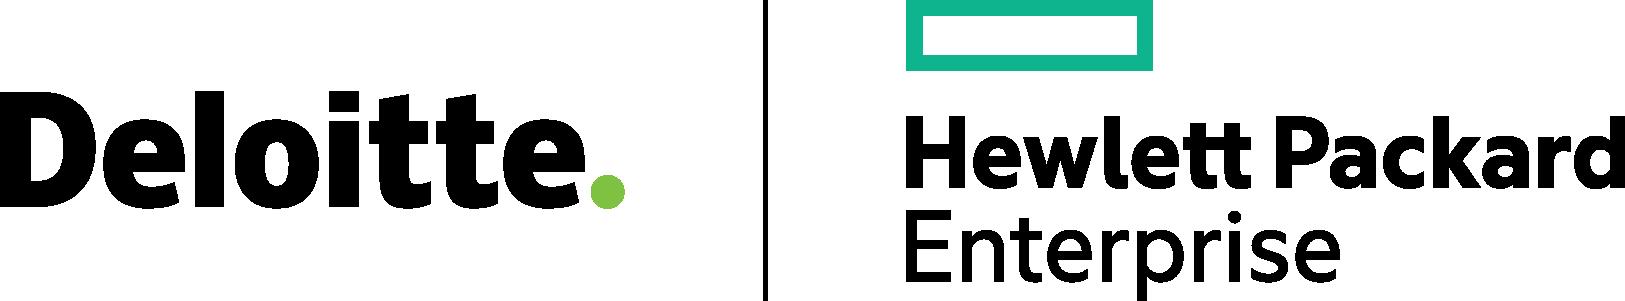 Deloitte - Hewlett Packard Enterprise